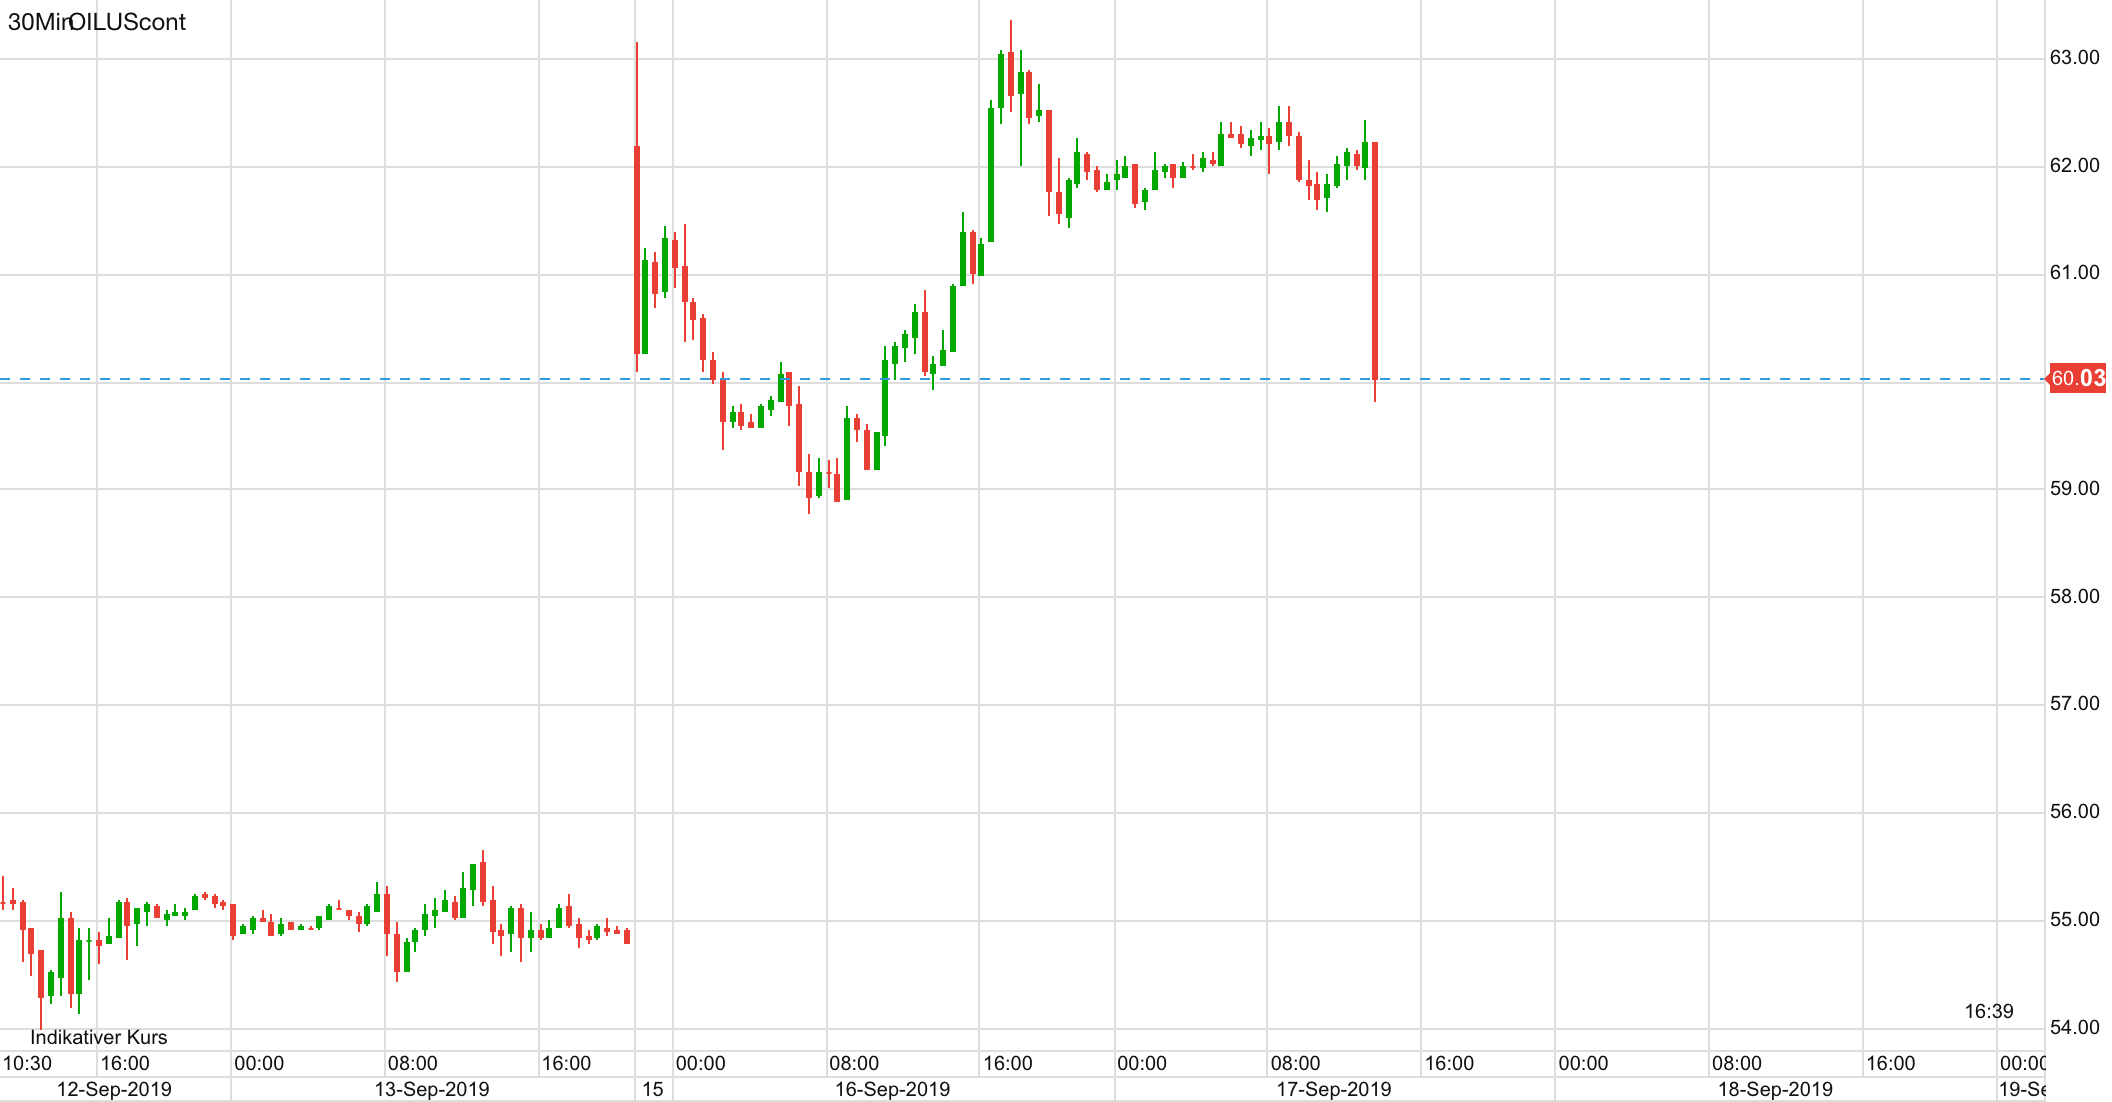 Ölpreis WTI seit Ende letzter Woche